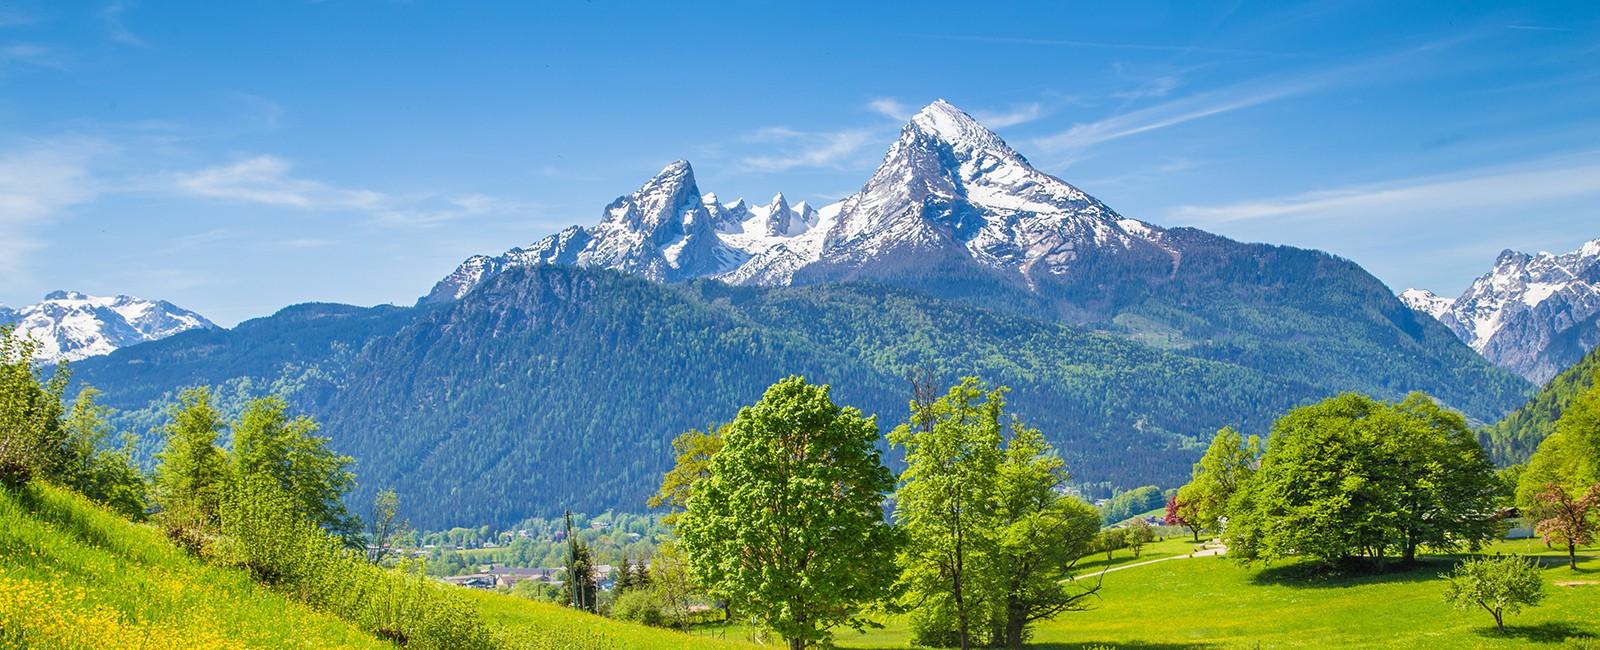 Sommerurlaub in Berchtesgaden